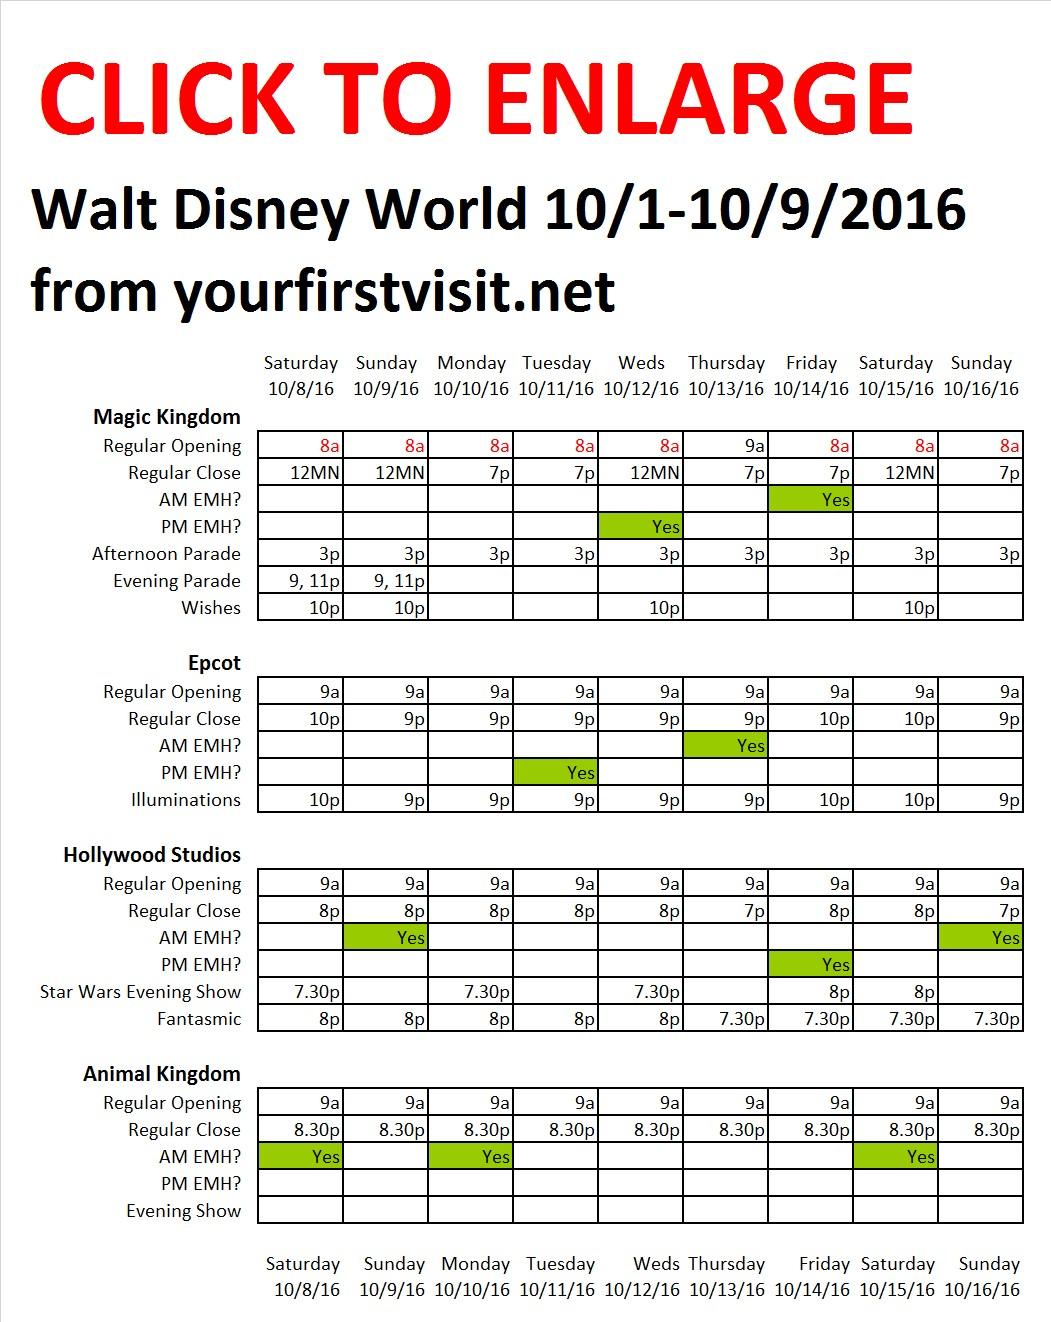 disney-world-10-8-to-10-16-2016-from-yourfirstvisit-net